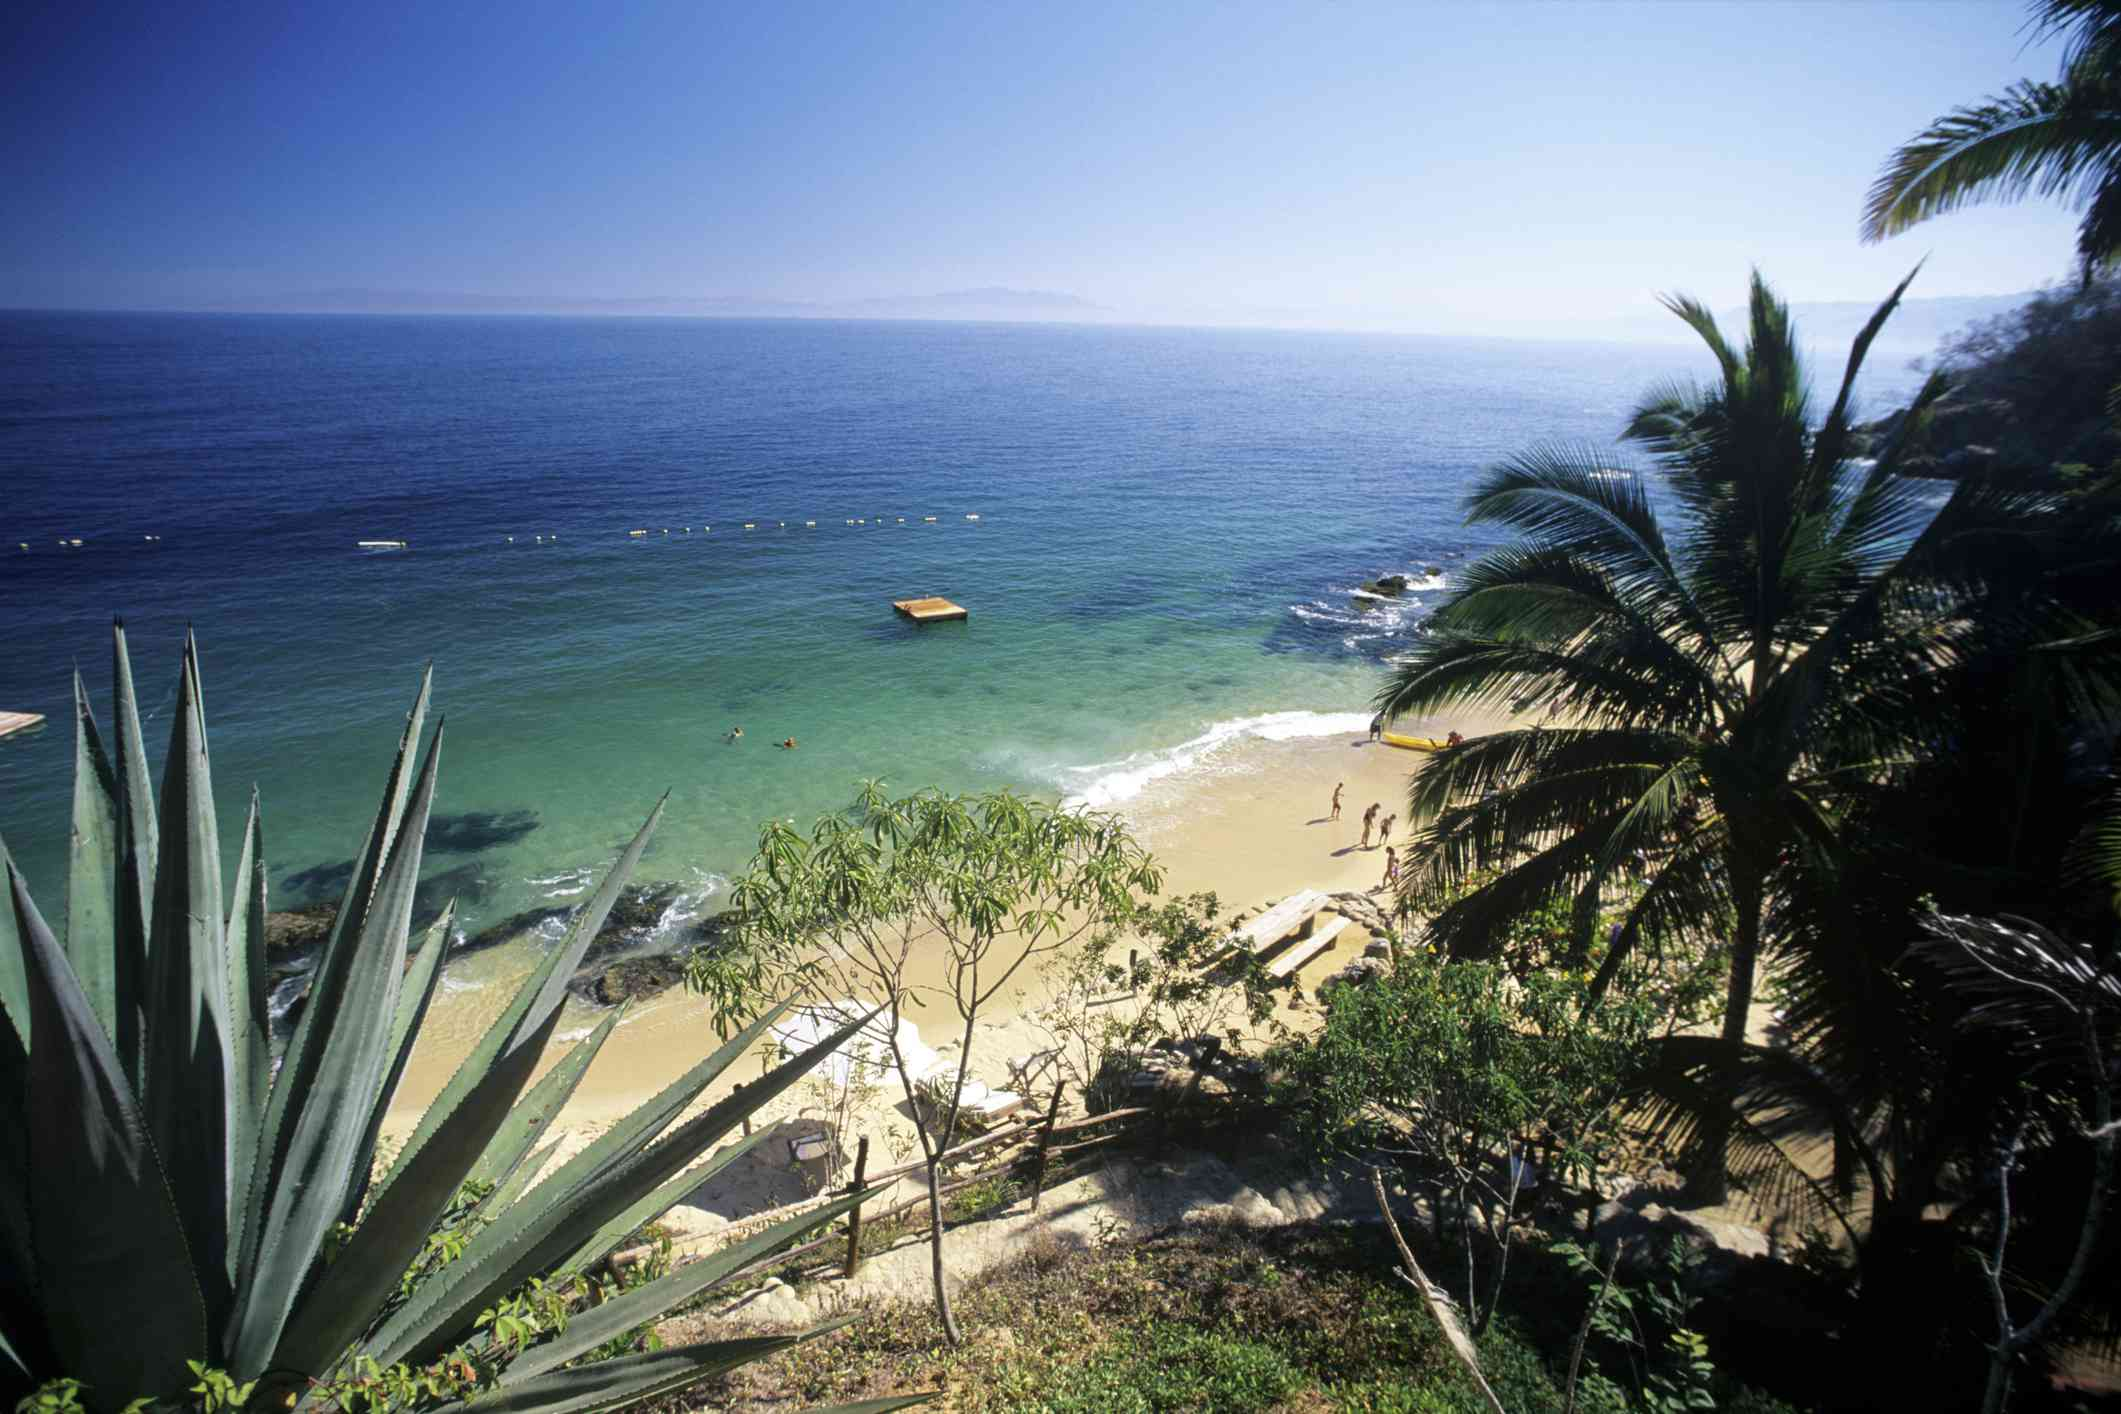 Playa Las Caletas